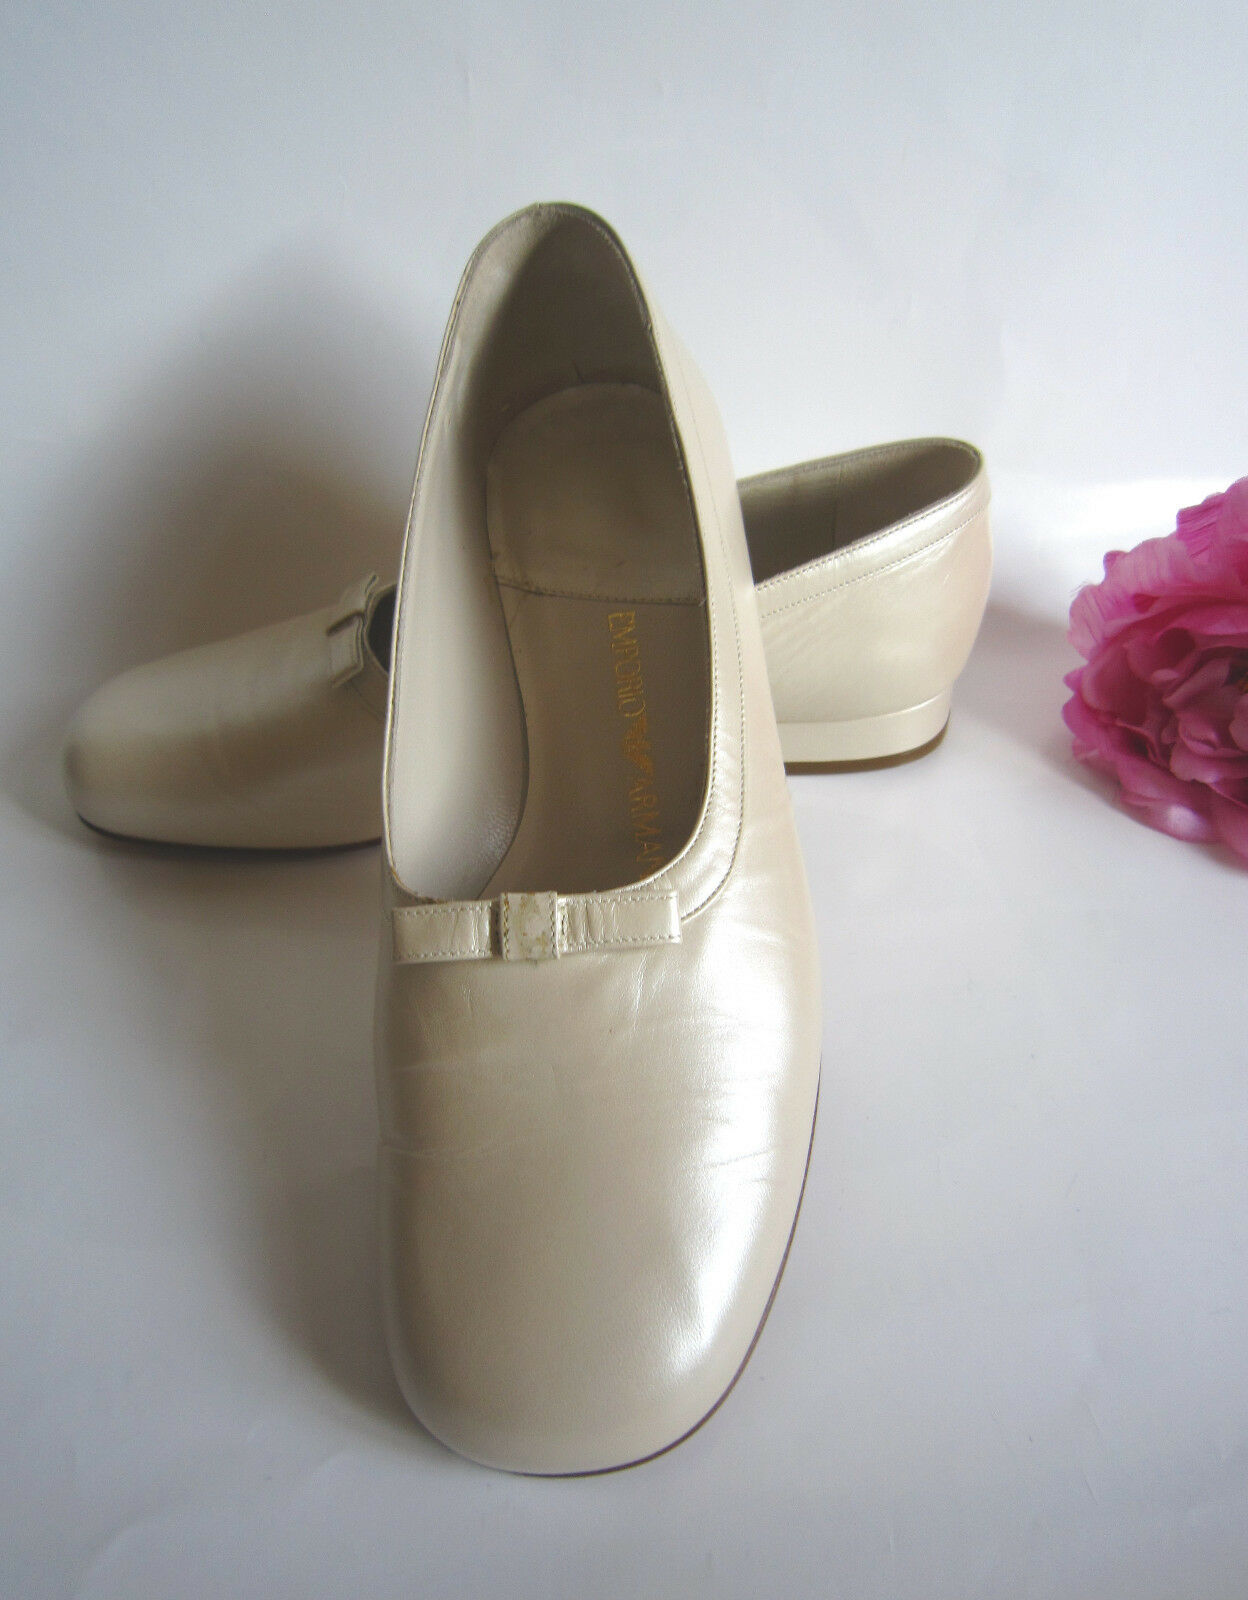 Emporio Armani designer leather shoes, size 37,5(5UK). 100% authentic.